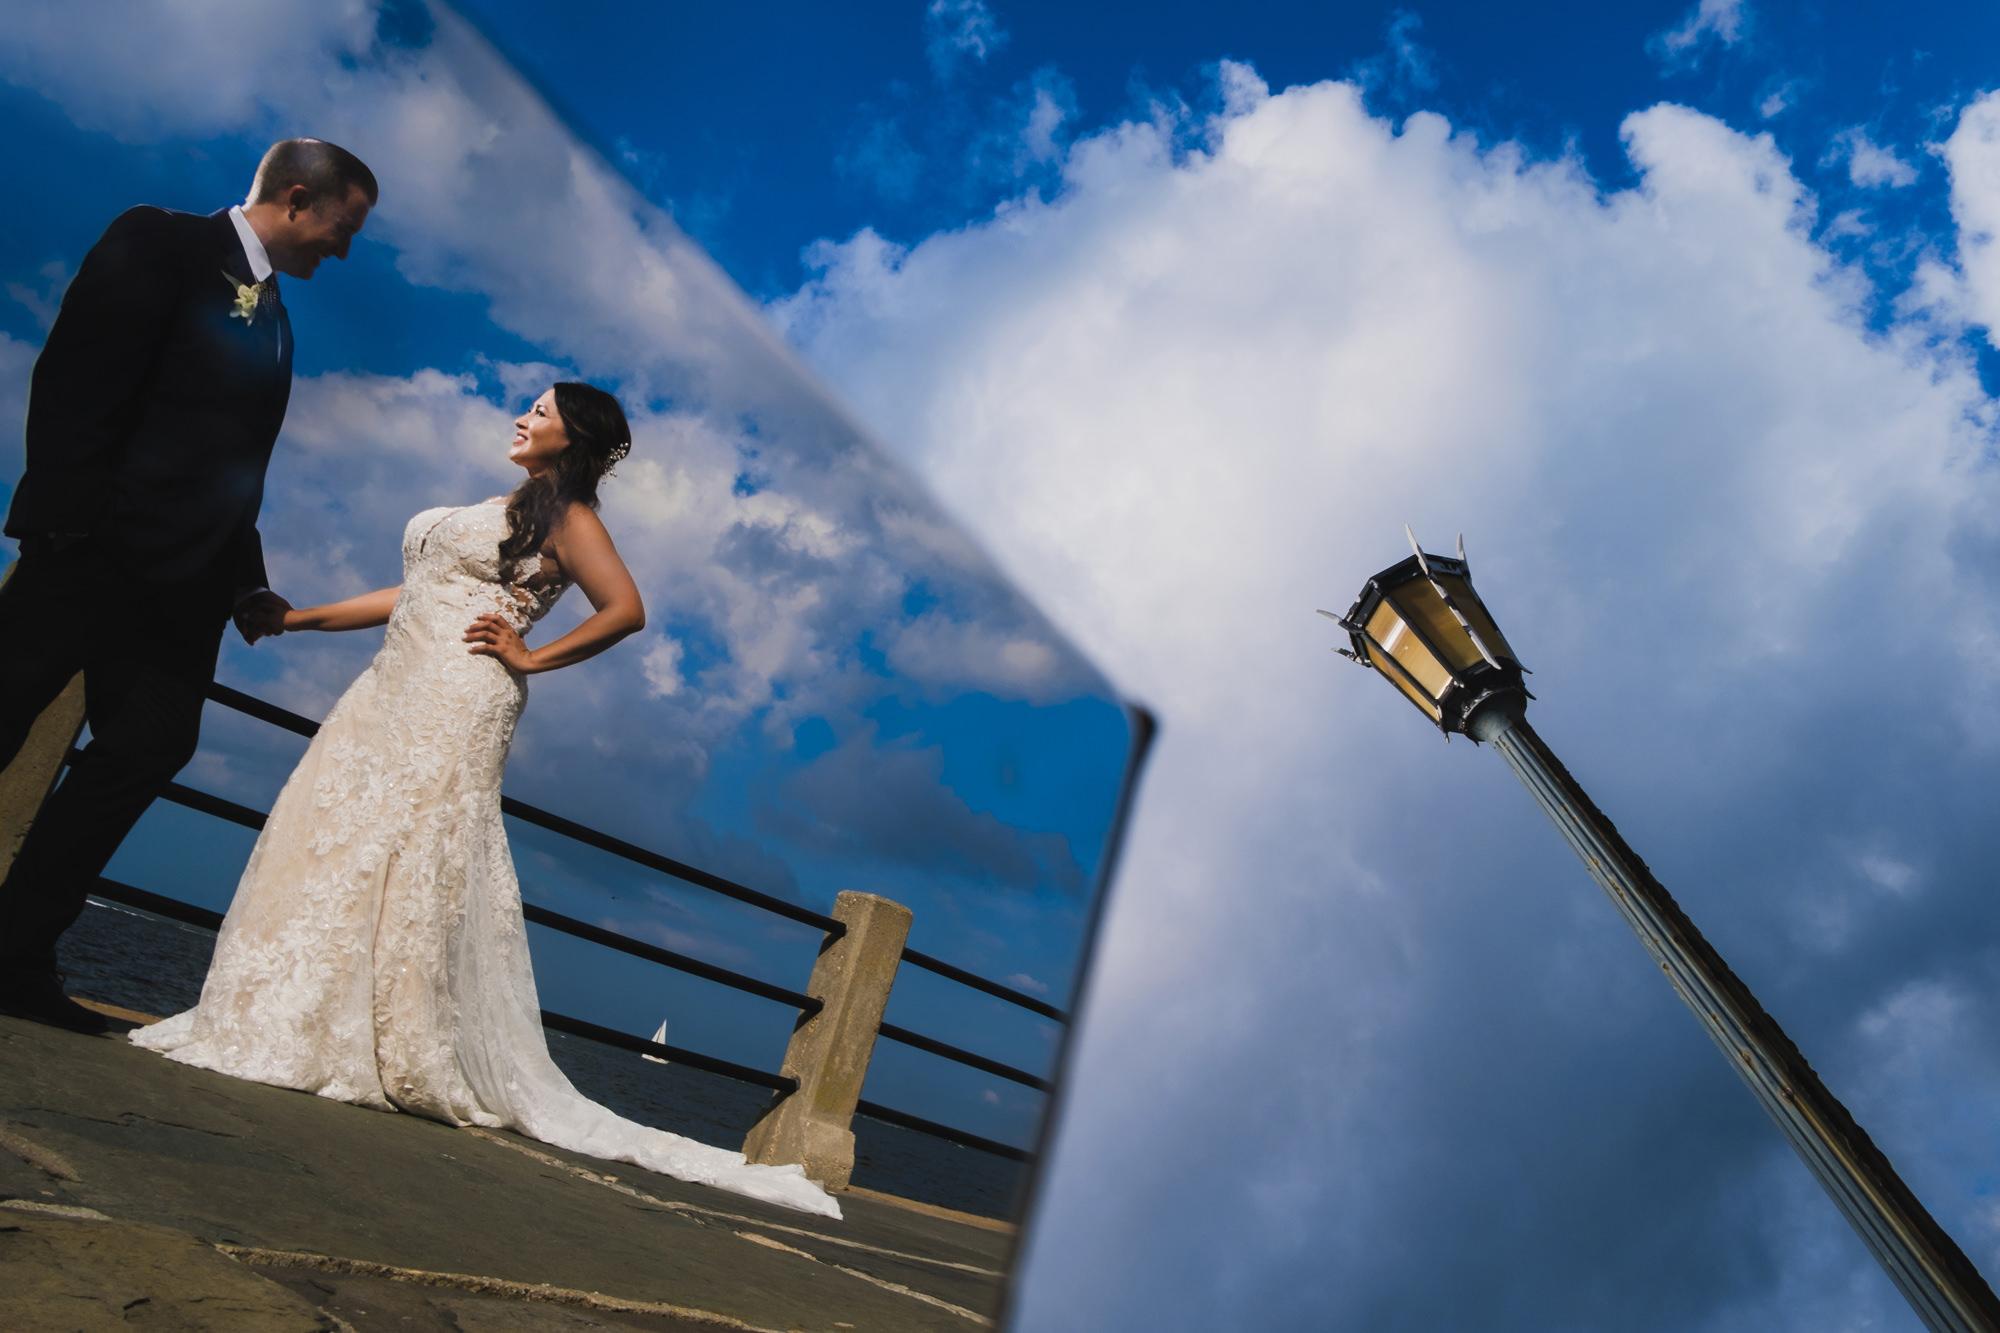 bride and groom creative reflection portrait- photo by Chrisman Studios, charleston, restoration